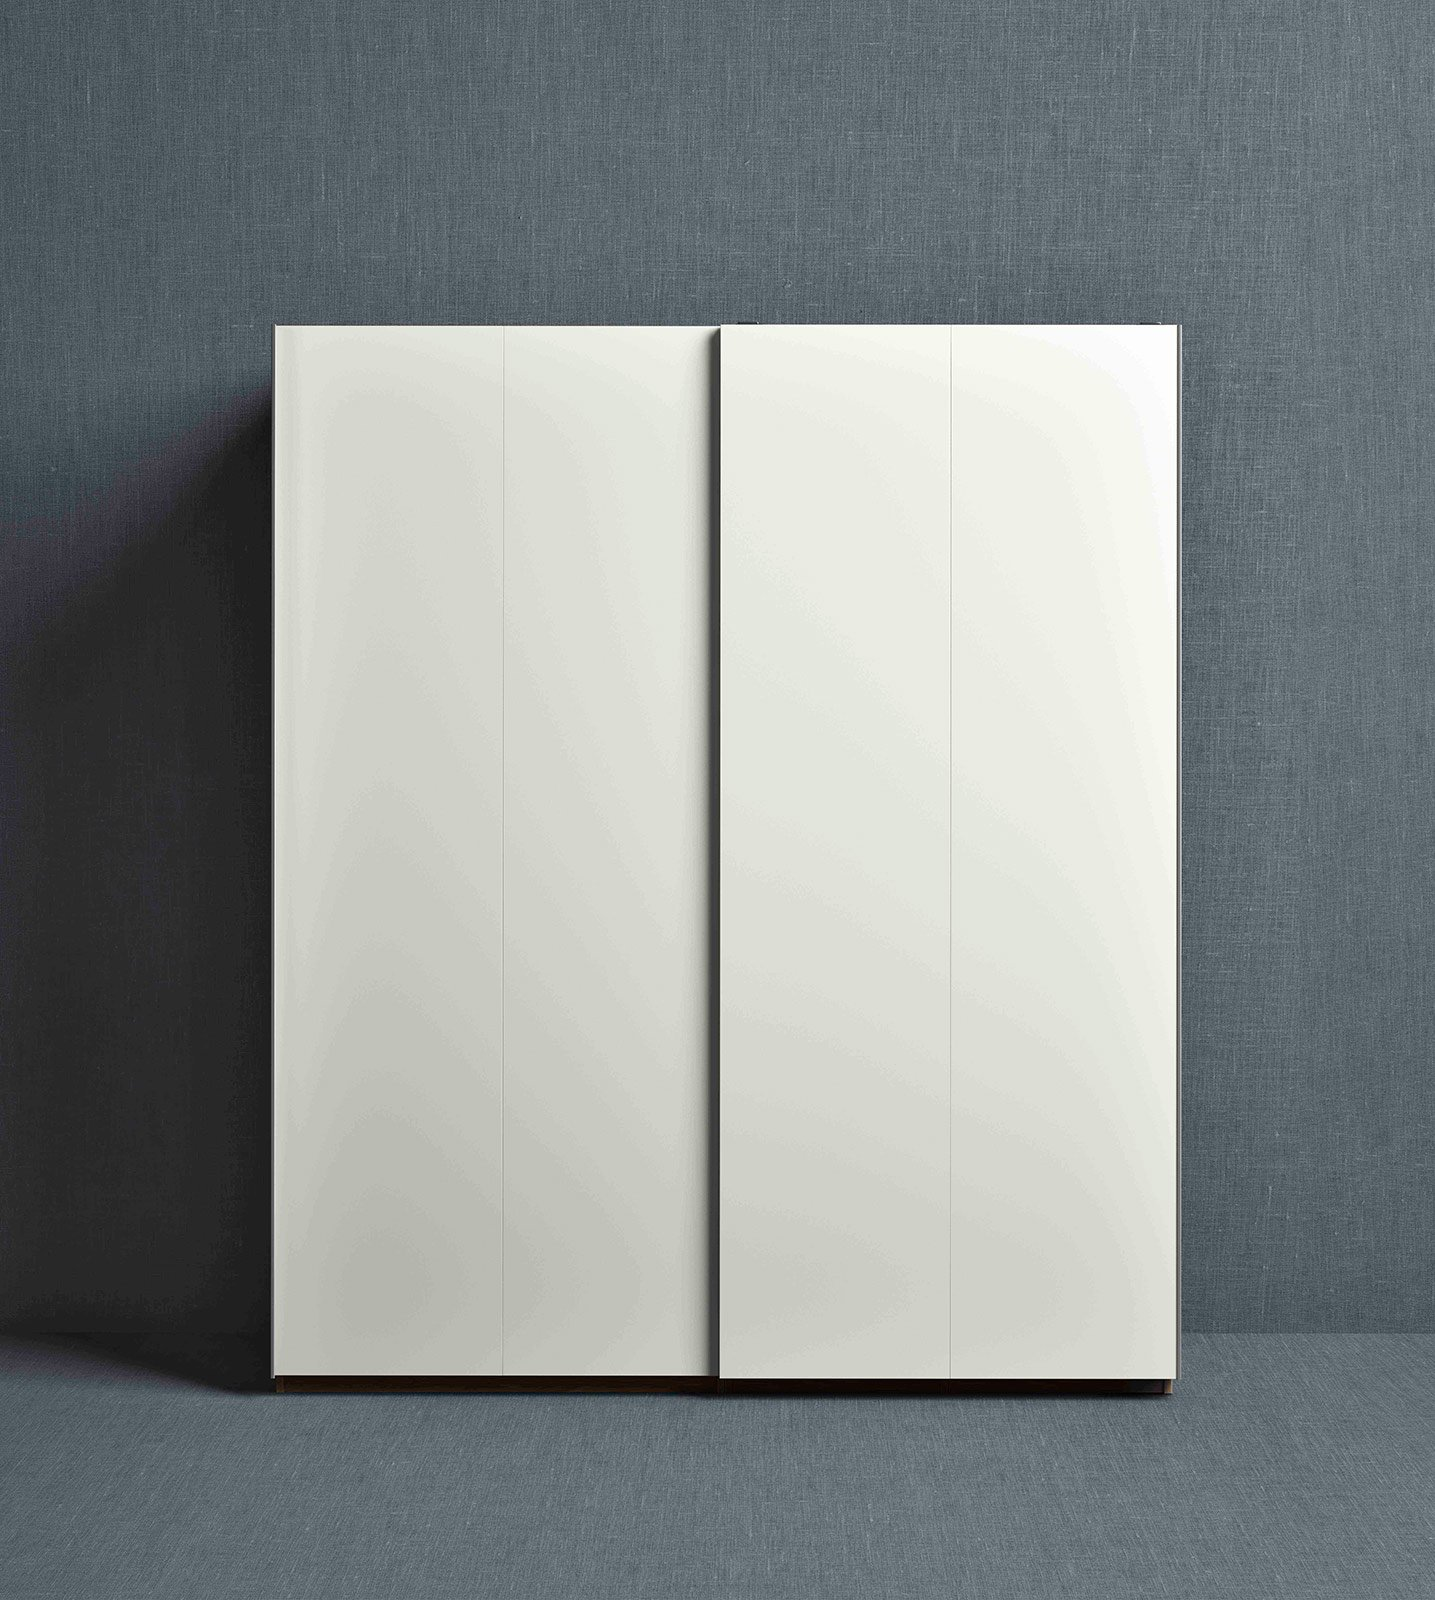 Armadi total white cose di casa - Ikea armadi scorrevoli ...